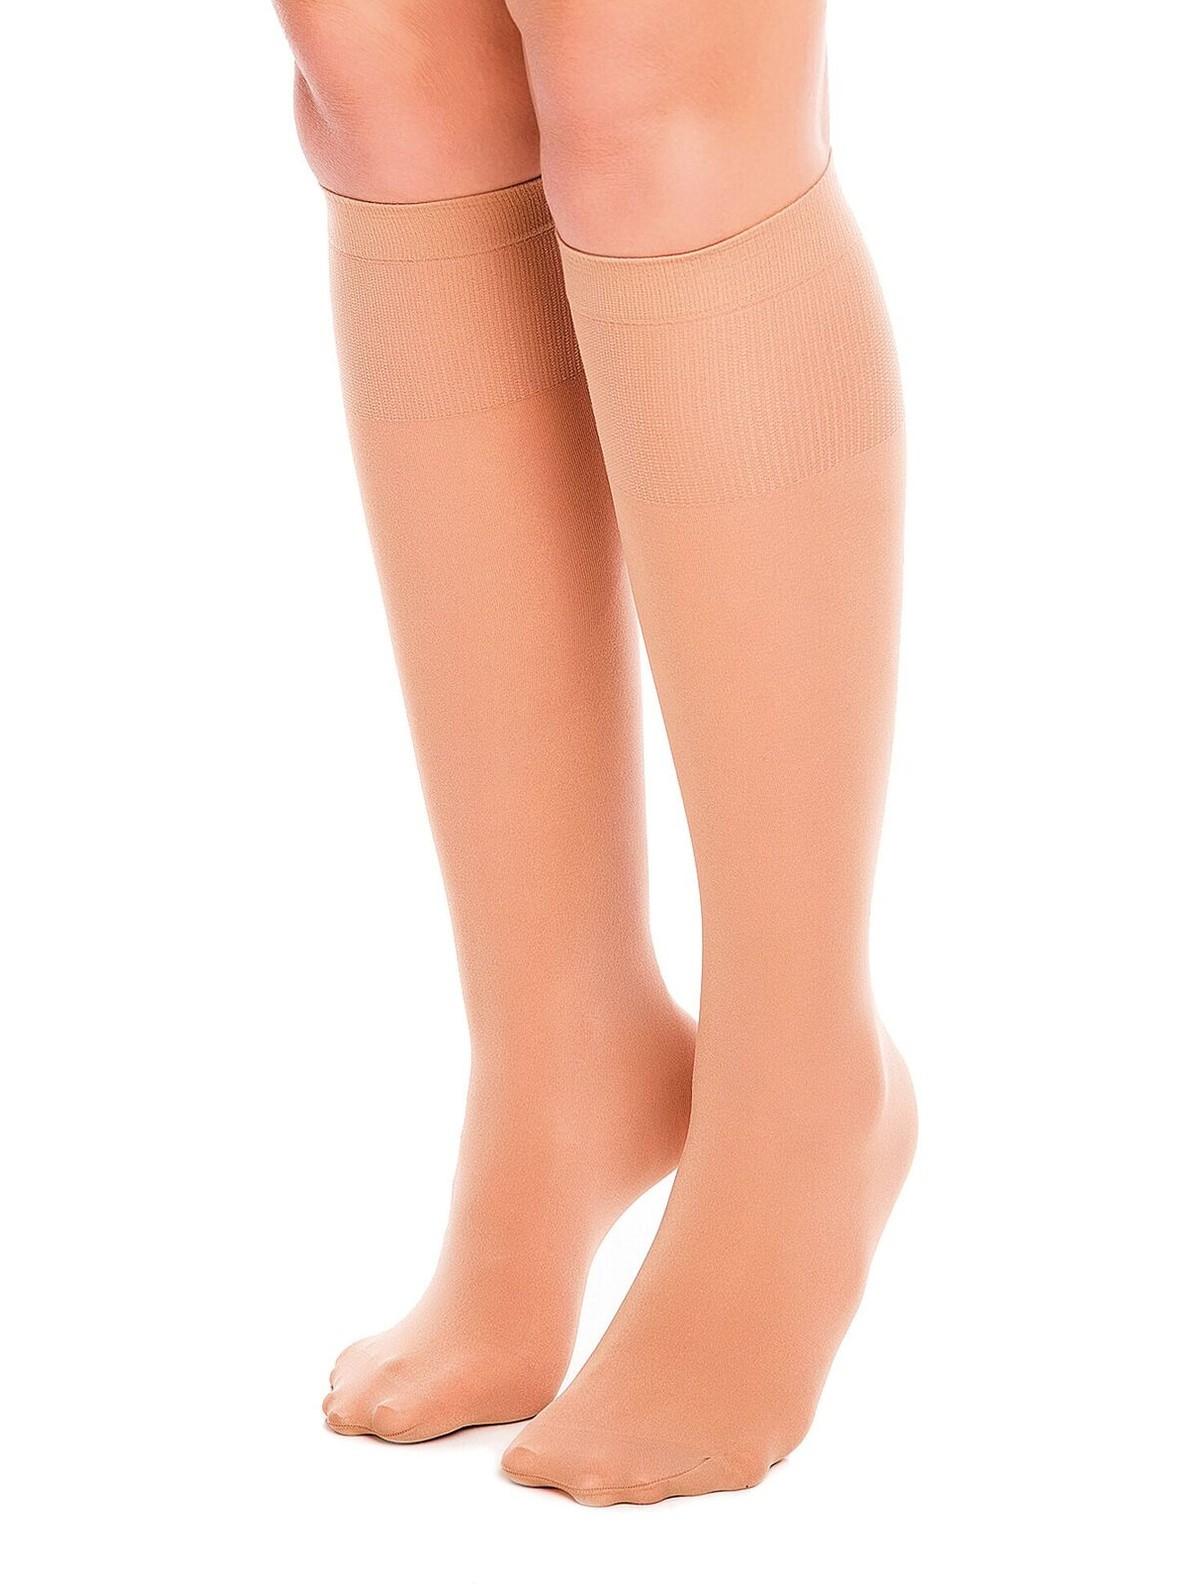 9408513909c ... Glamory Fit 50 Microfiber Knee High Socks make-up